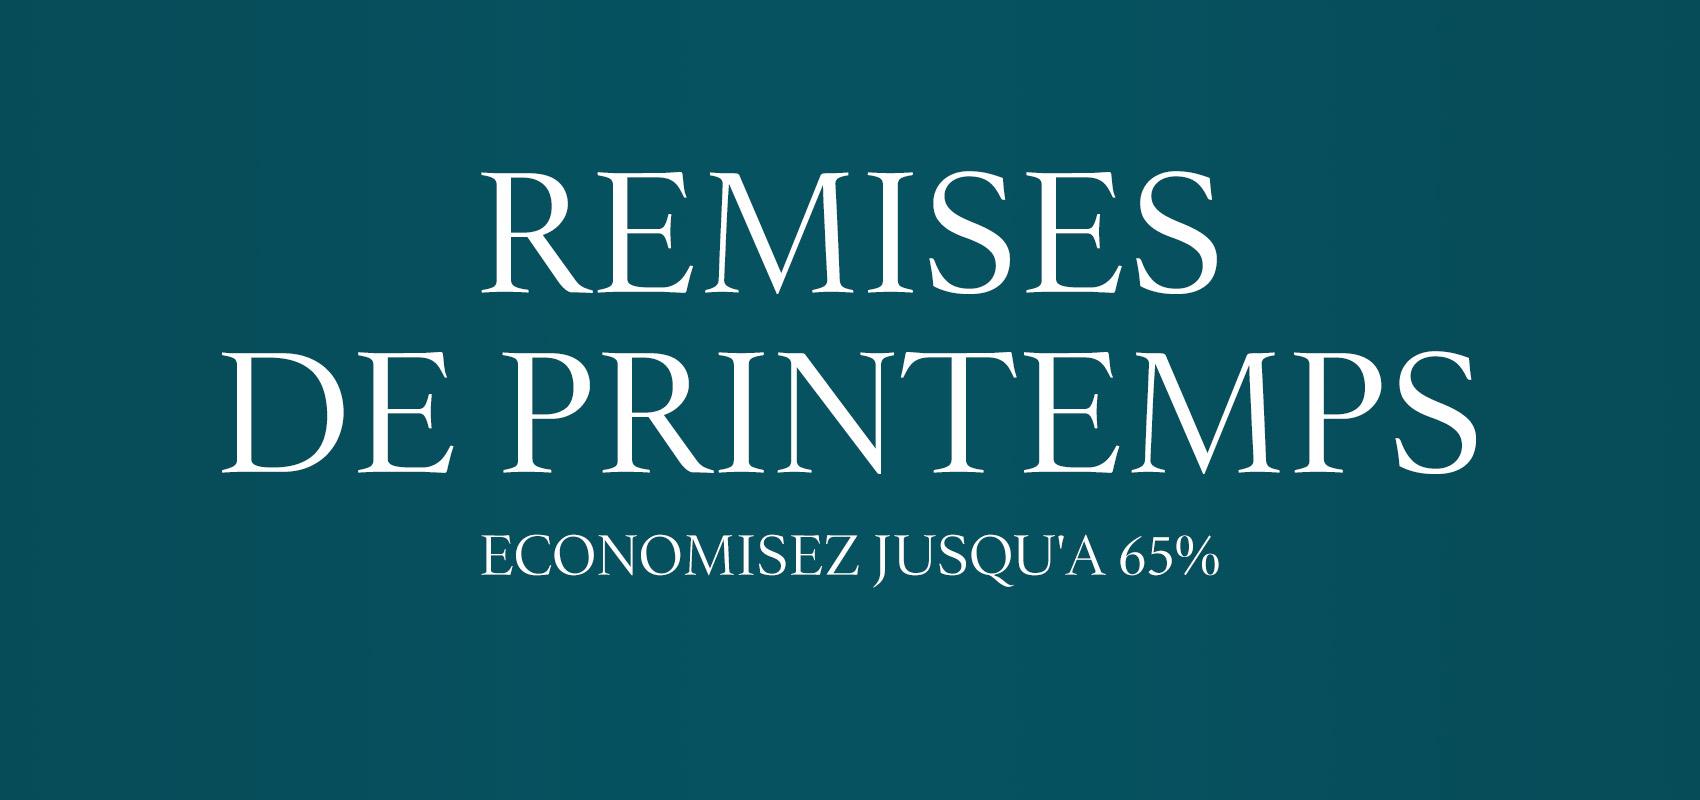 Charles Tyrwhitt rèductions - Economisez jusqu'a 65%